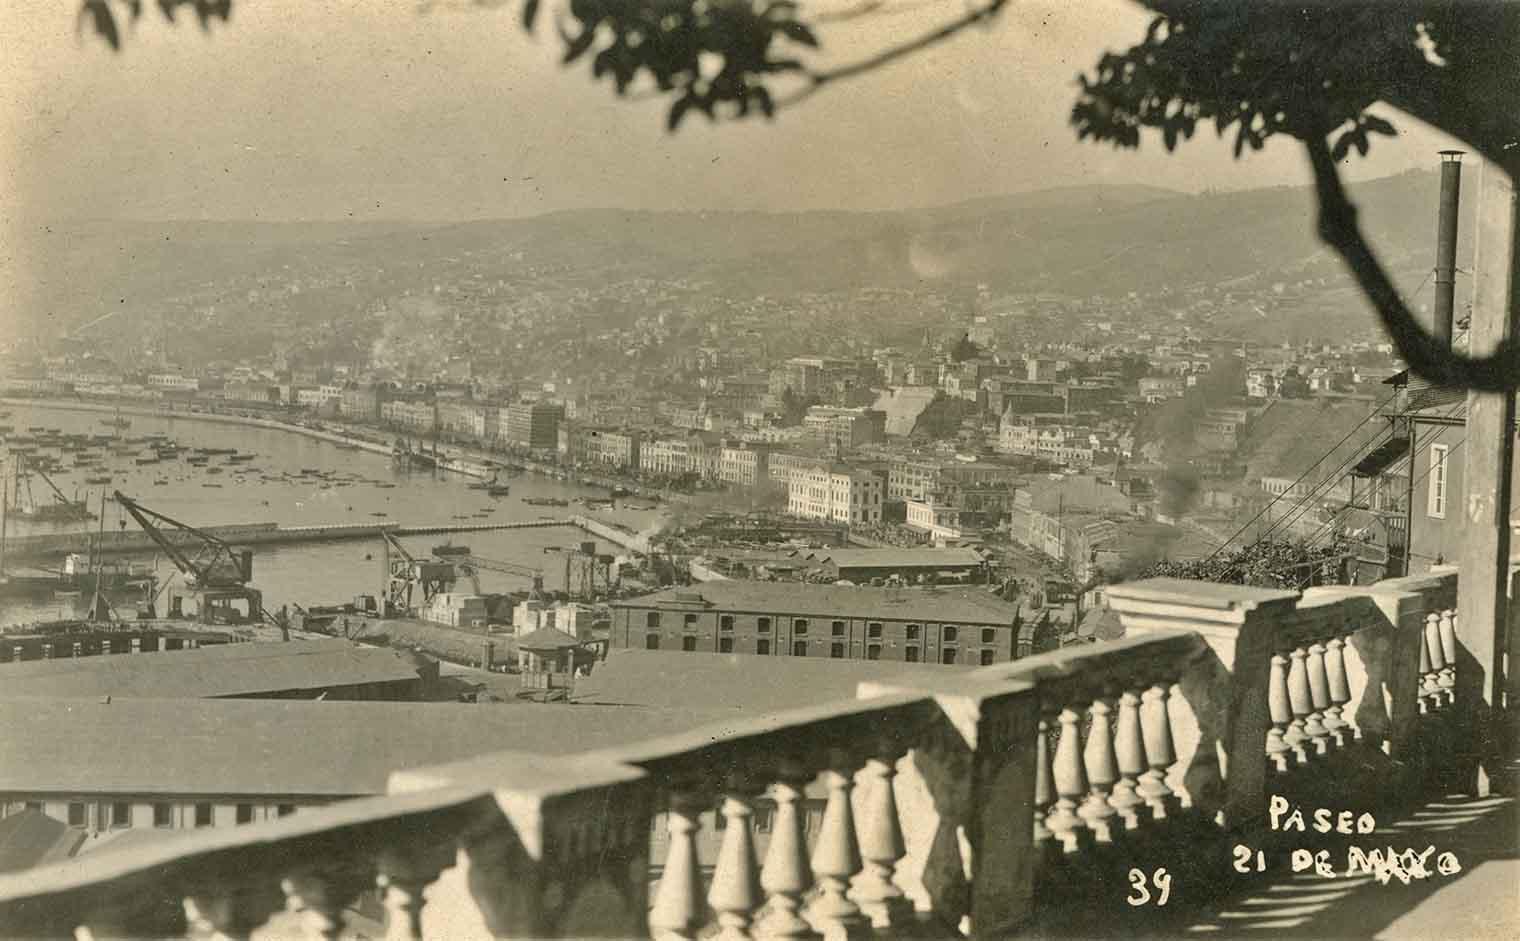 Enterreno - Fotos históricas de chile - fotos antiguas de Chile - Vista de Valparaíso en 1925